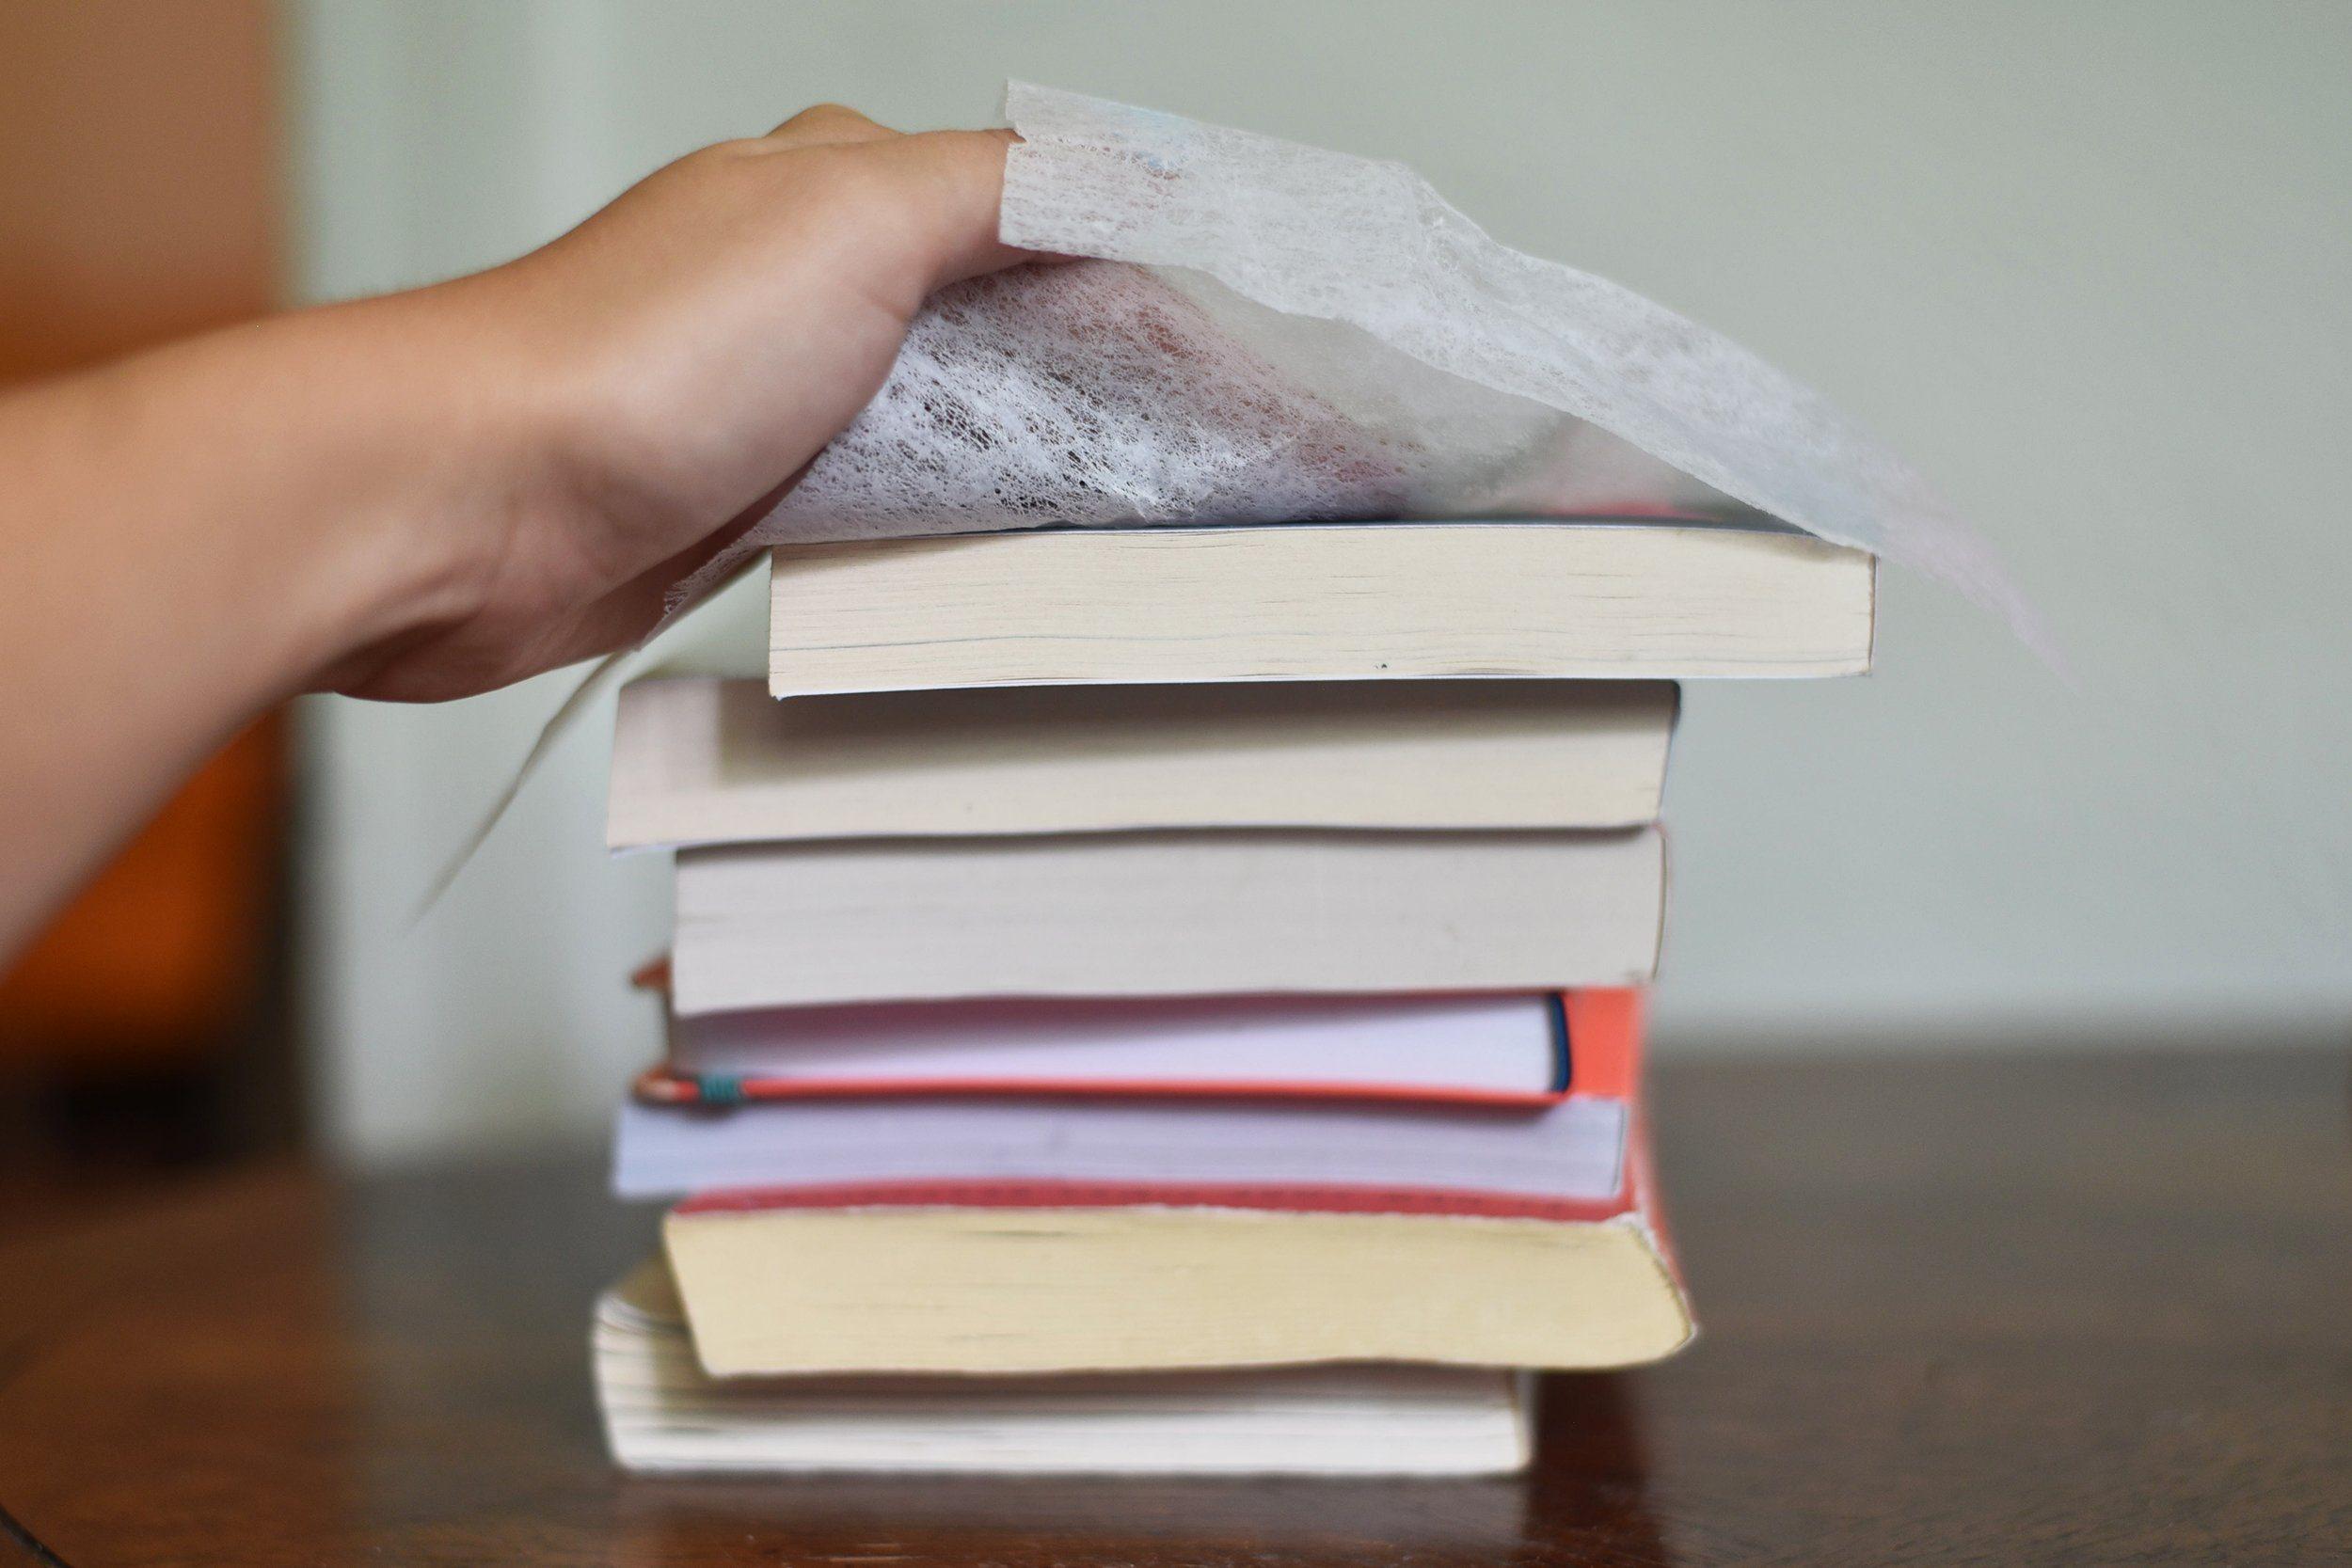 books dryer sheet uses